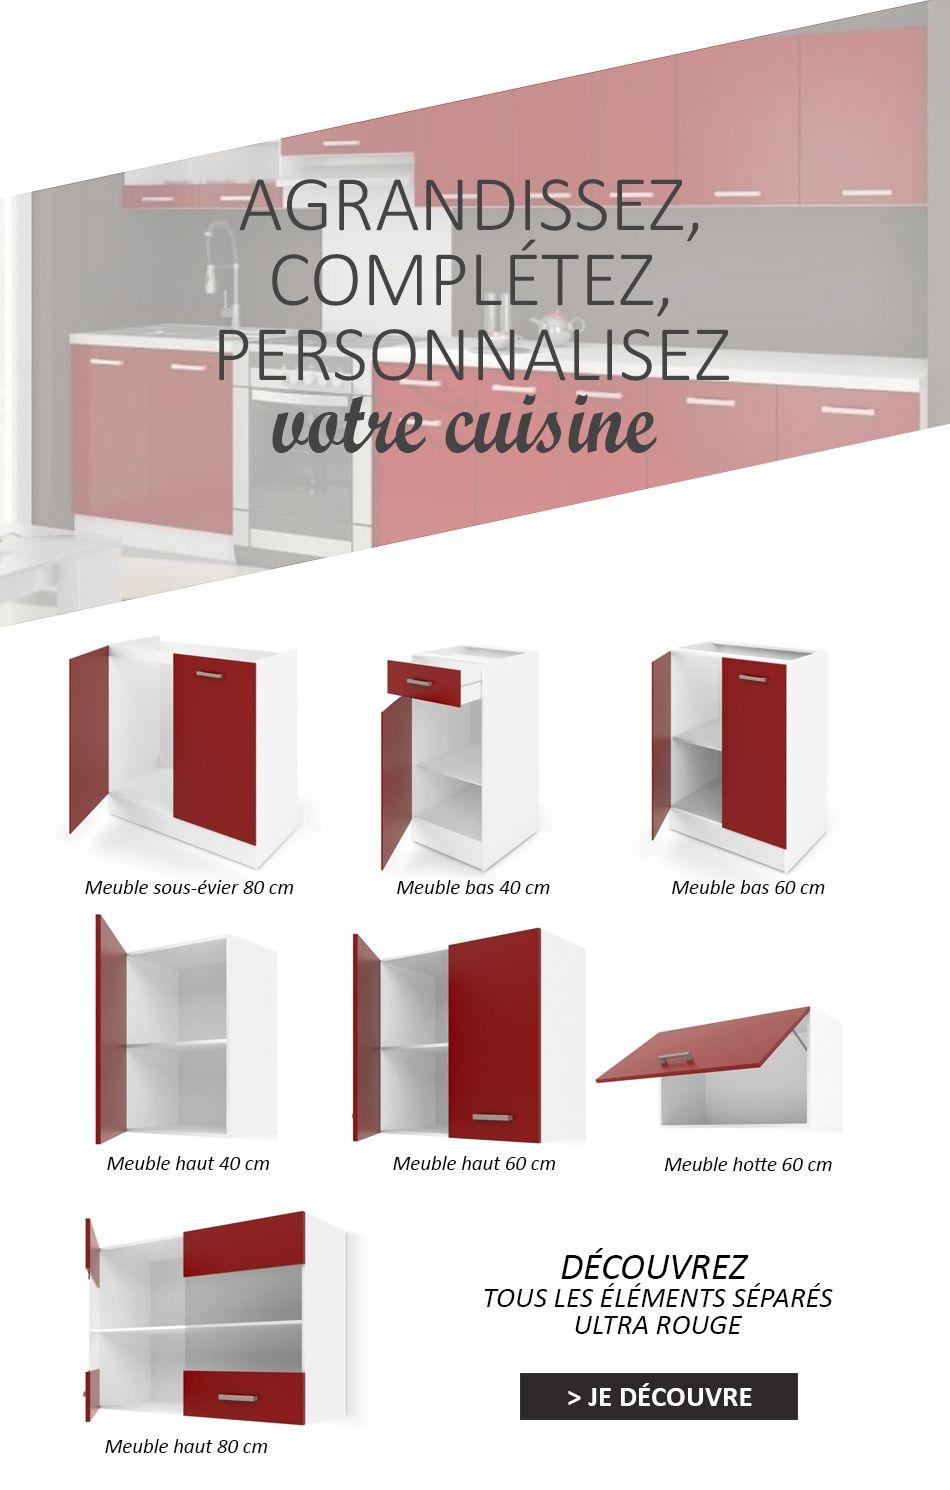 Ultra xxl cuisine compl te l 3m20 rouge mat achat for Cuisine xxl cdiscount